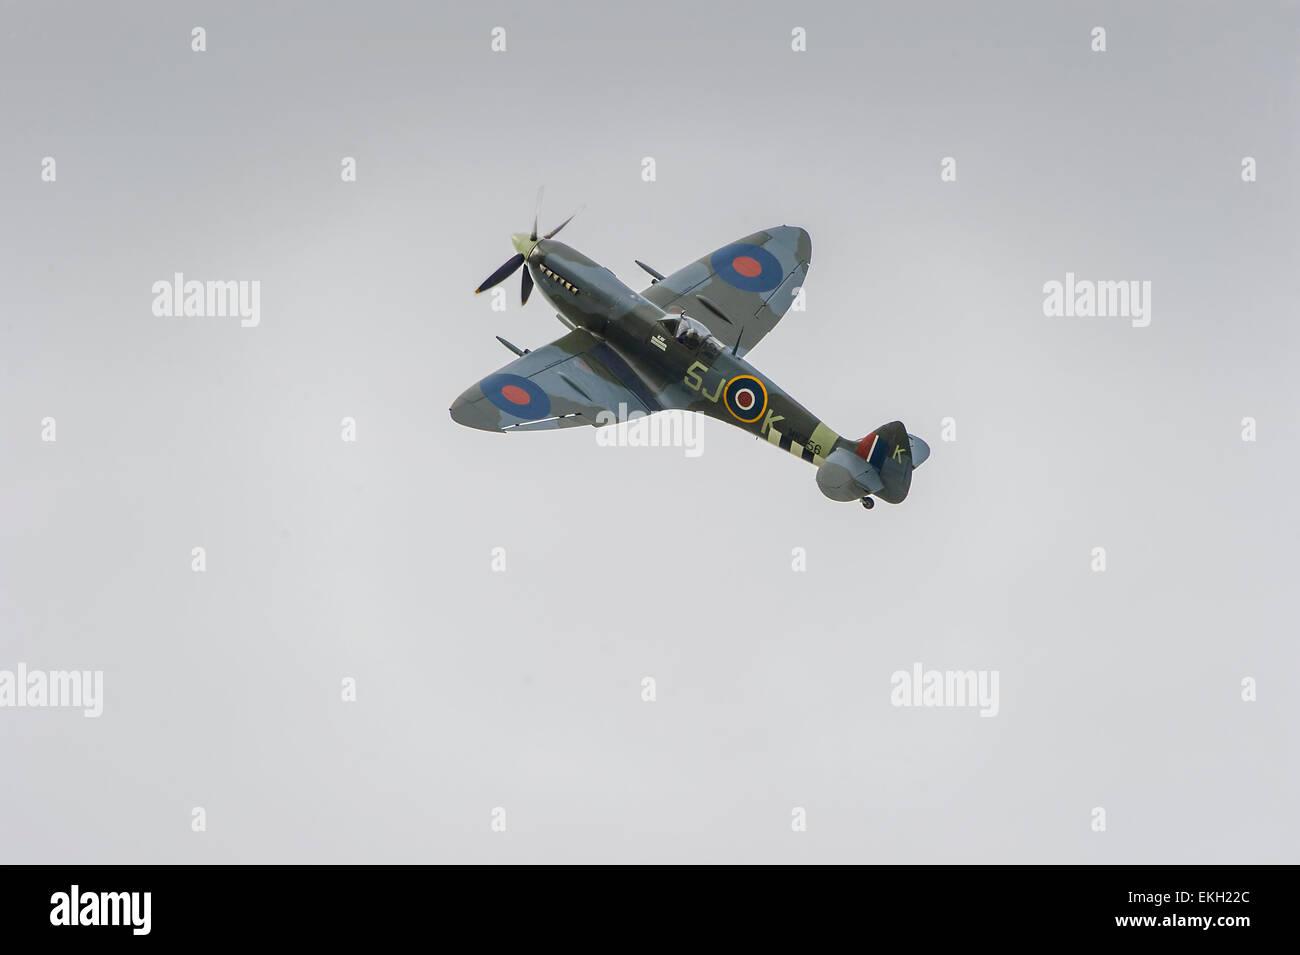 RAF BBMF Spitfire MK356 LFIXe Stock Photo